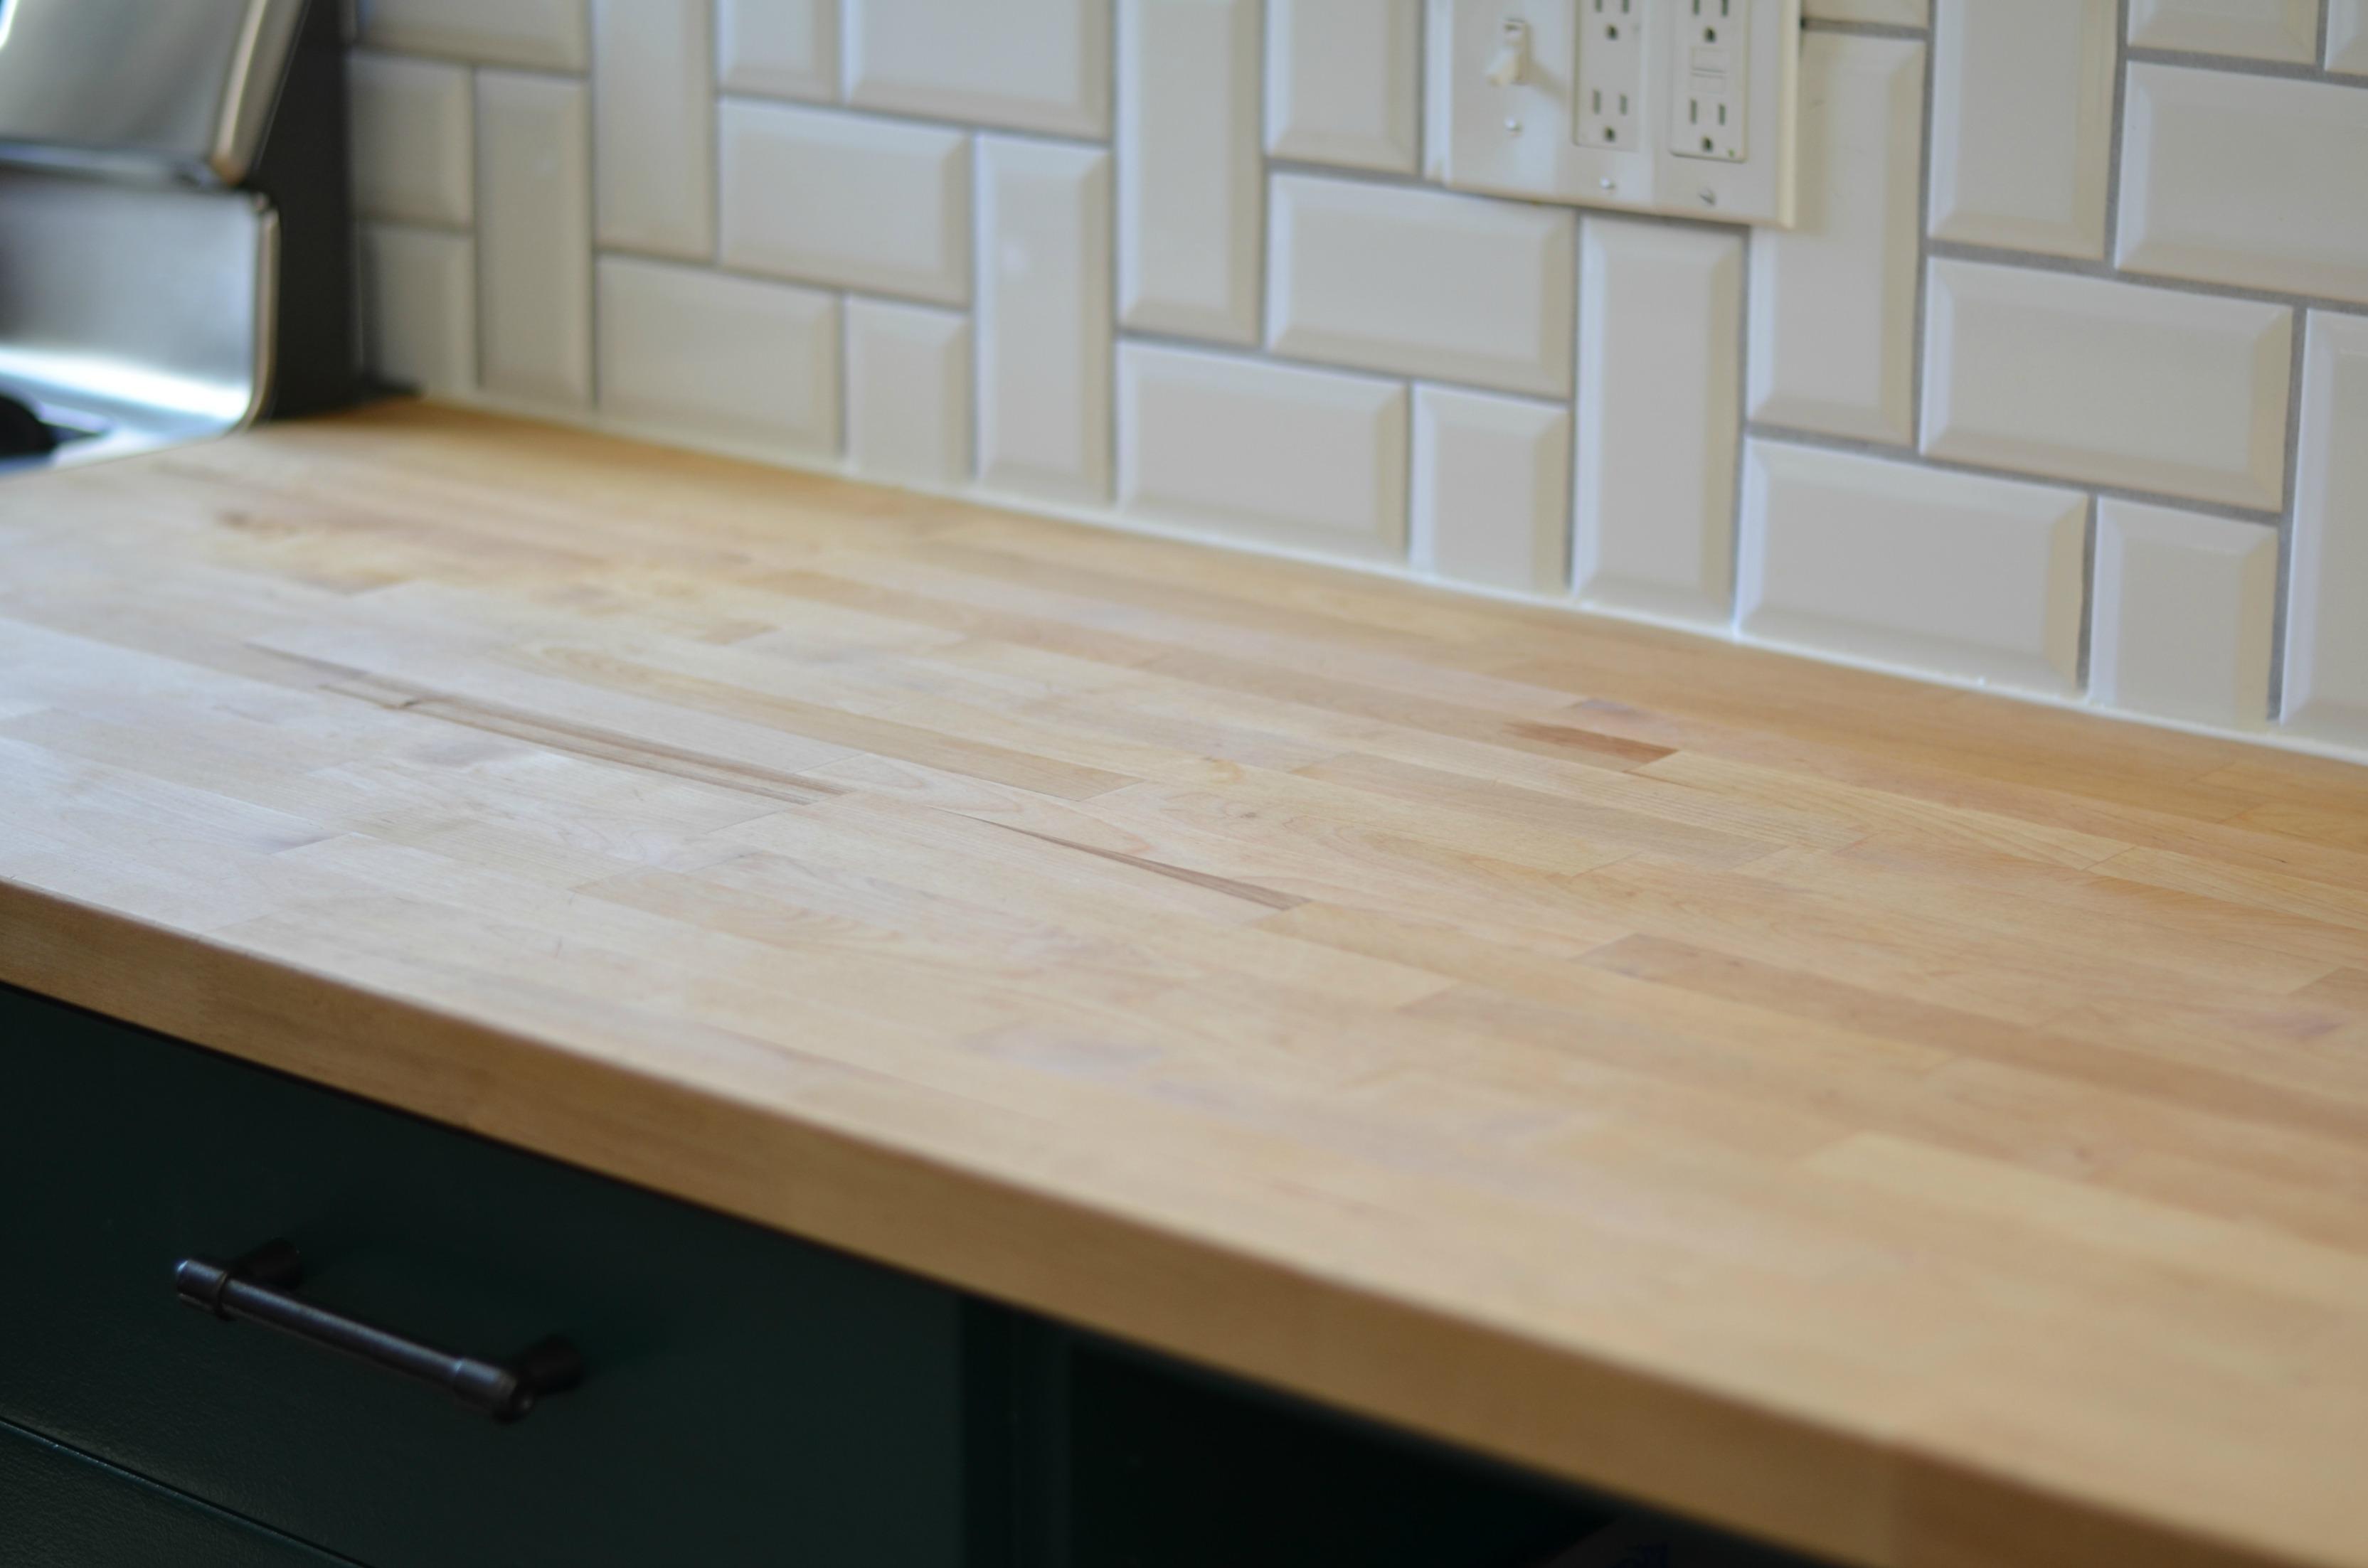 thisld modern furniture kitchen oak countertopn countertop wood img countertops island block custom white order with butcher blog